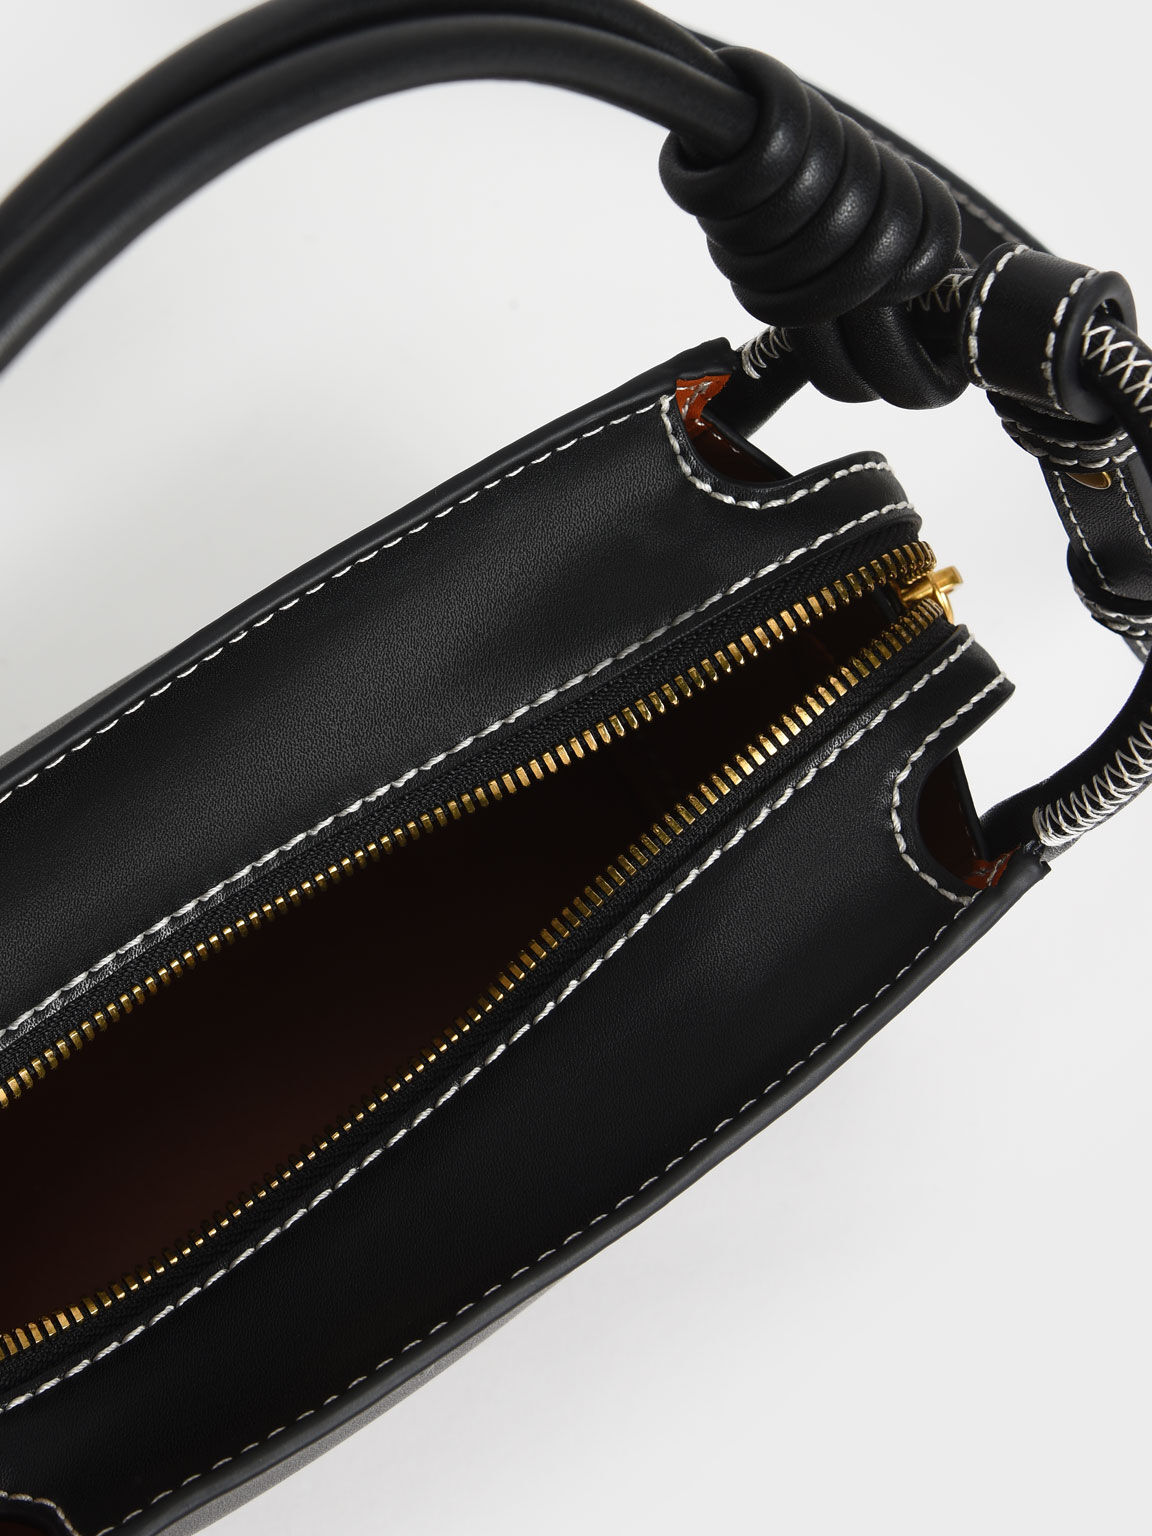 繩索手提方包, 黑色, hi-res